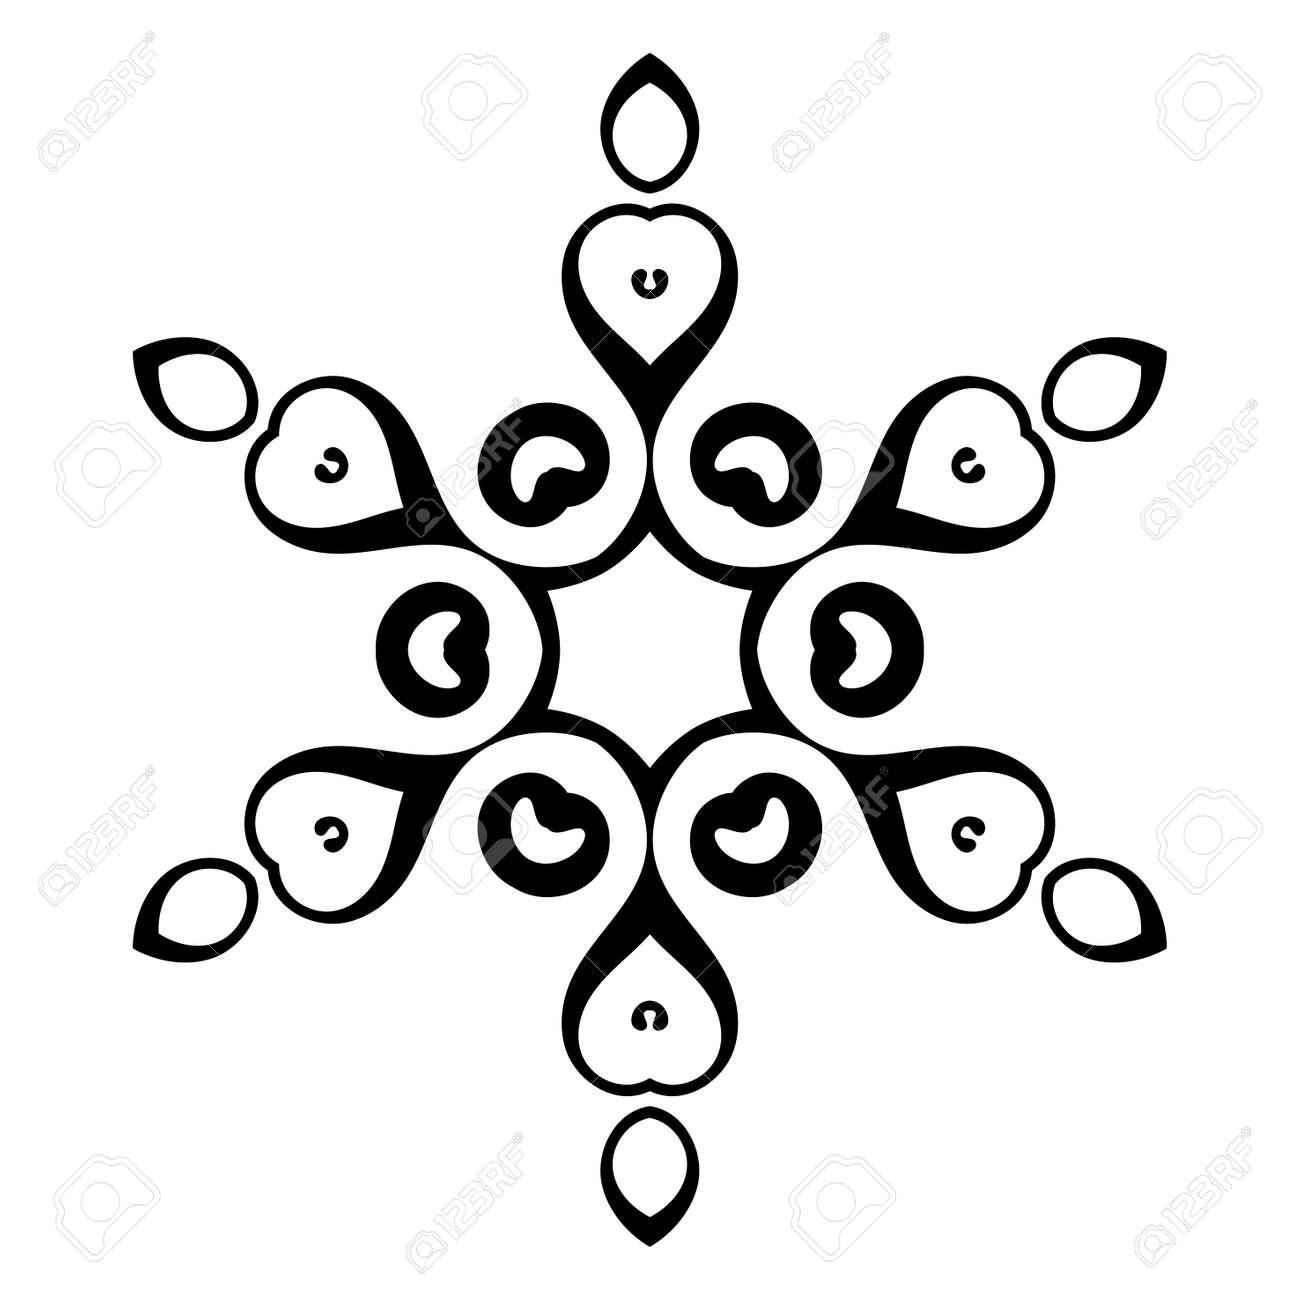 Black ornamental round doodle snowflake, flower isolated on white background. Outline mandala. Geometric circle element. Vector illustration. - 135429563